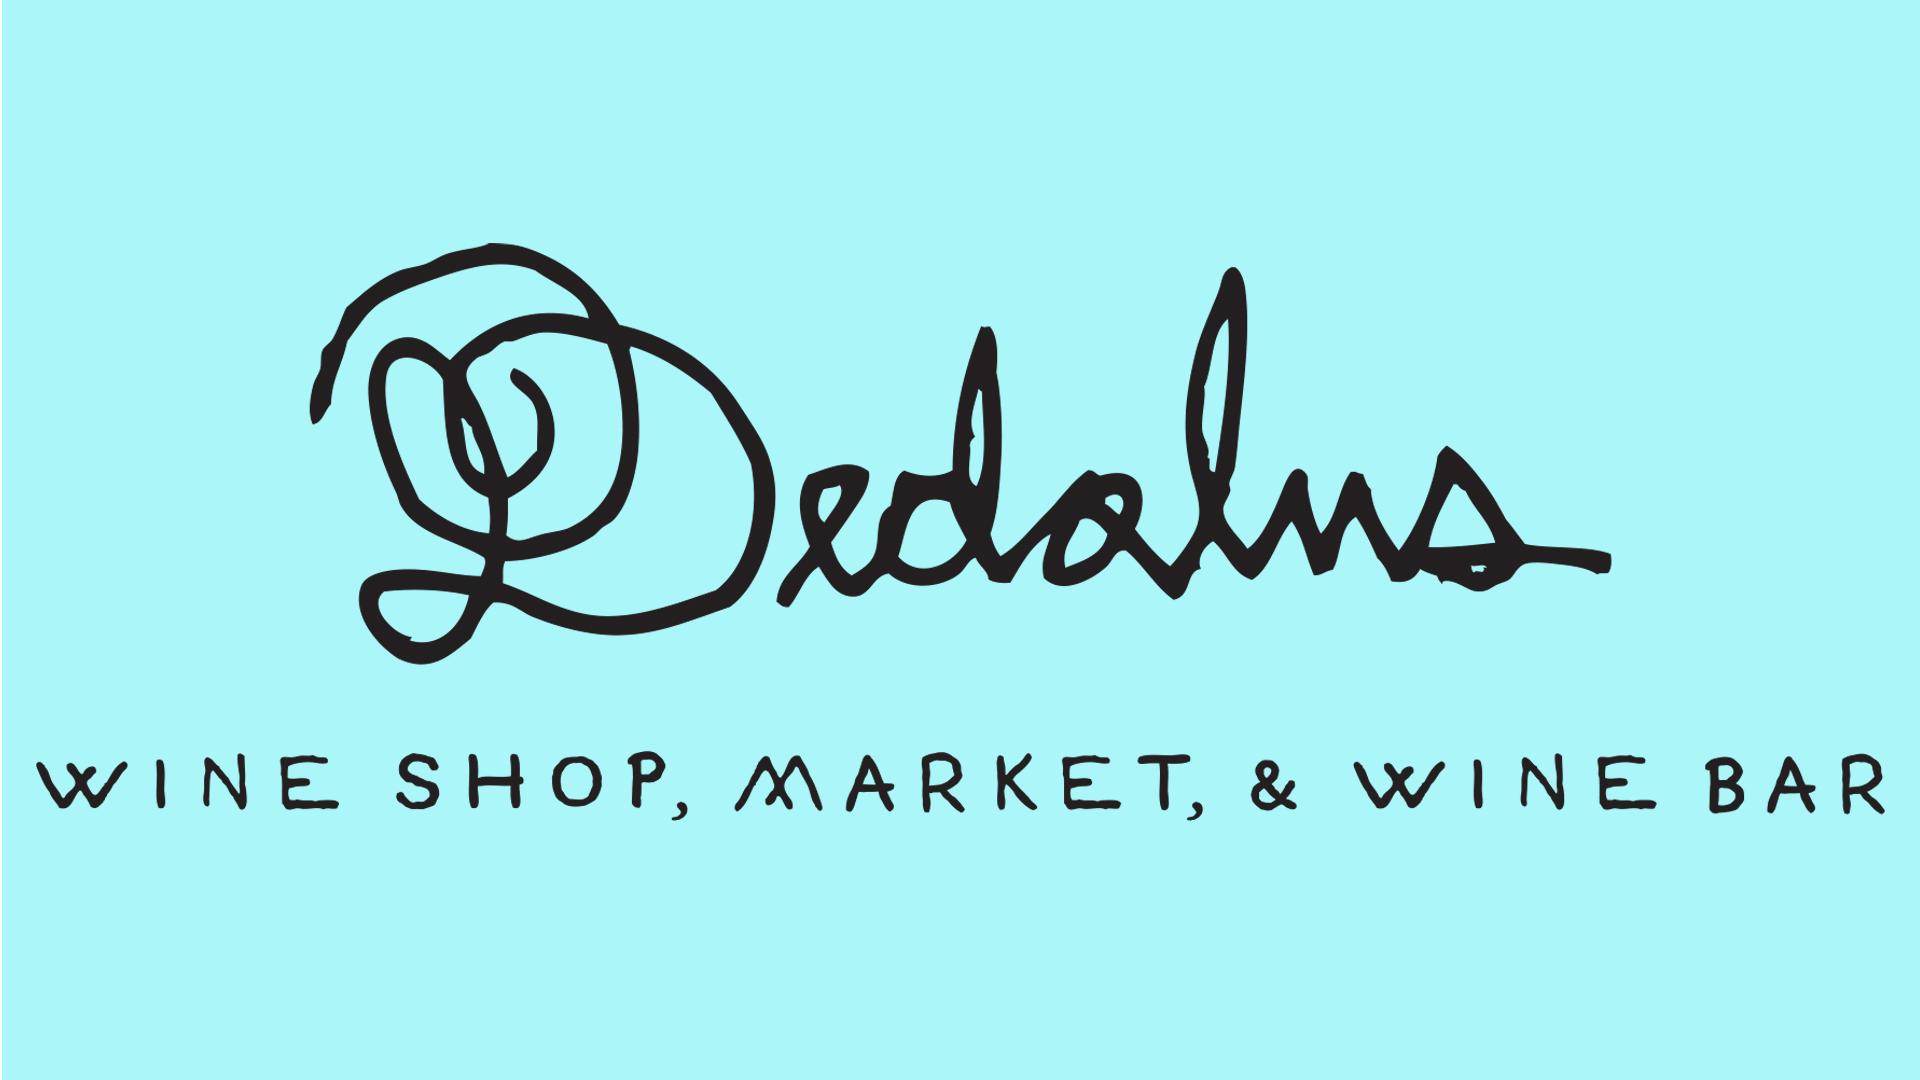 Dedalus Wine Shop, Market & Wine Bar